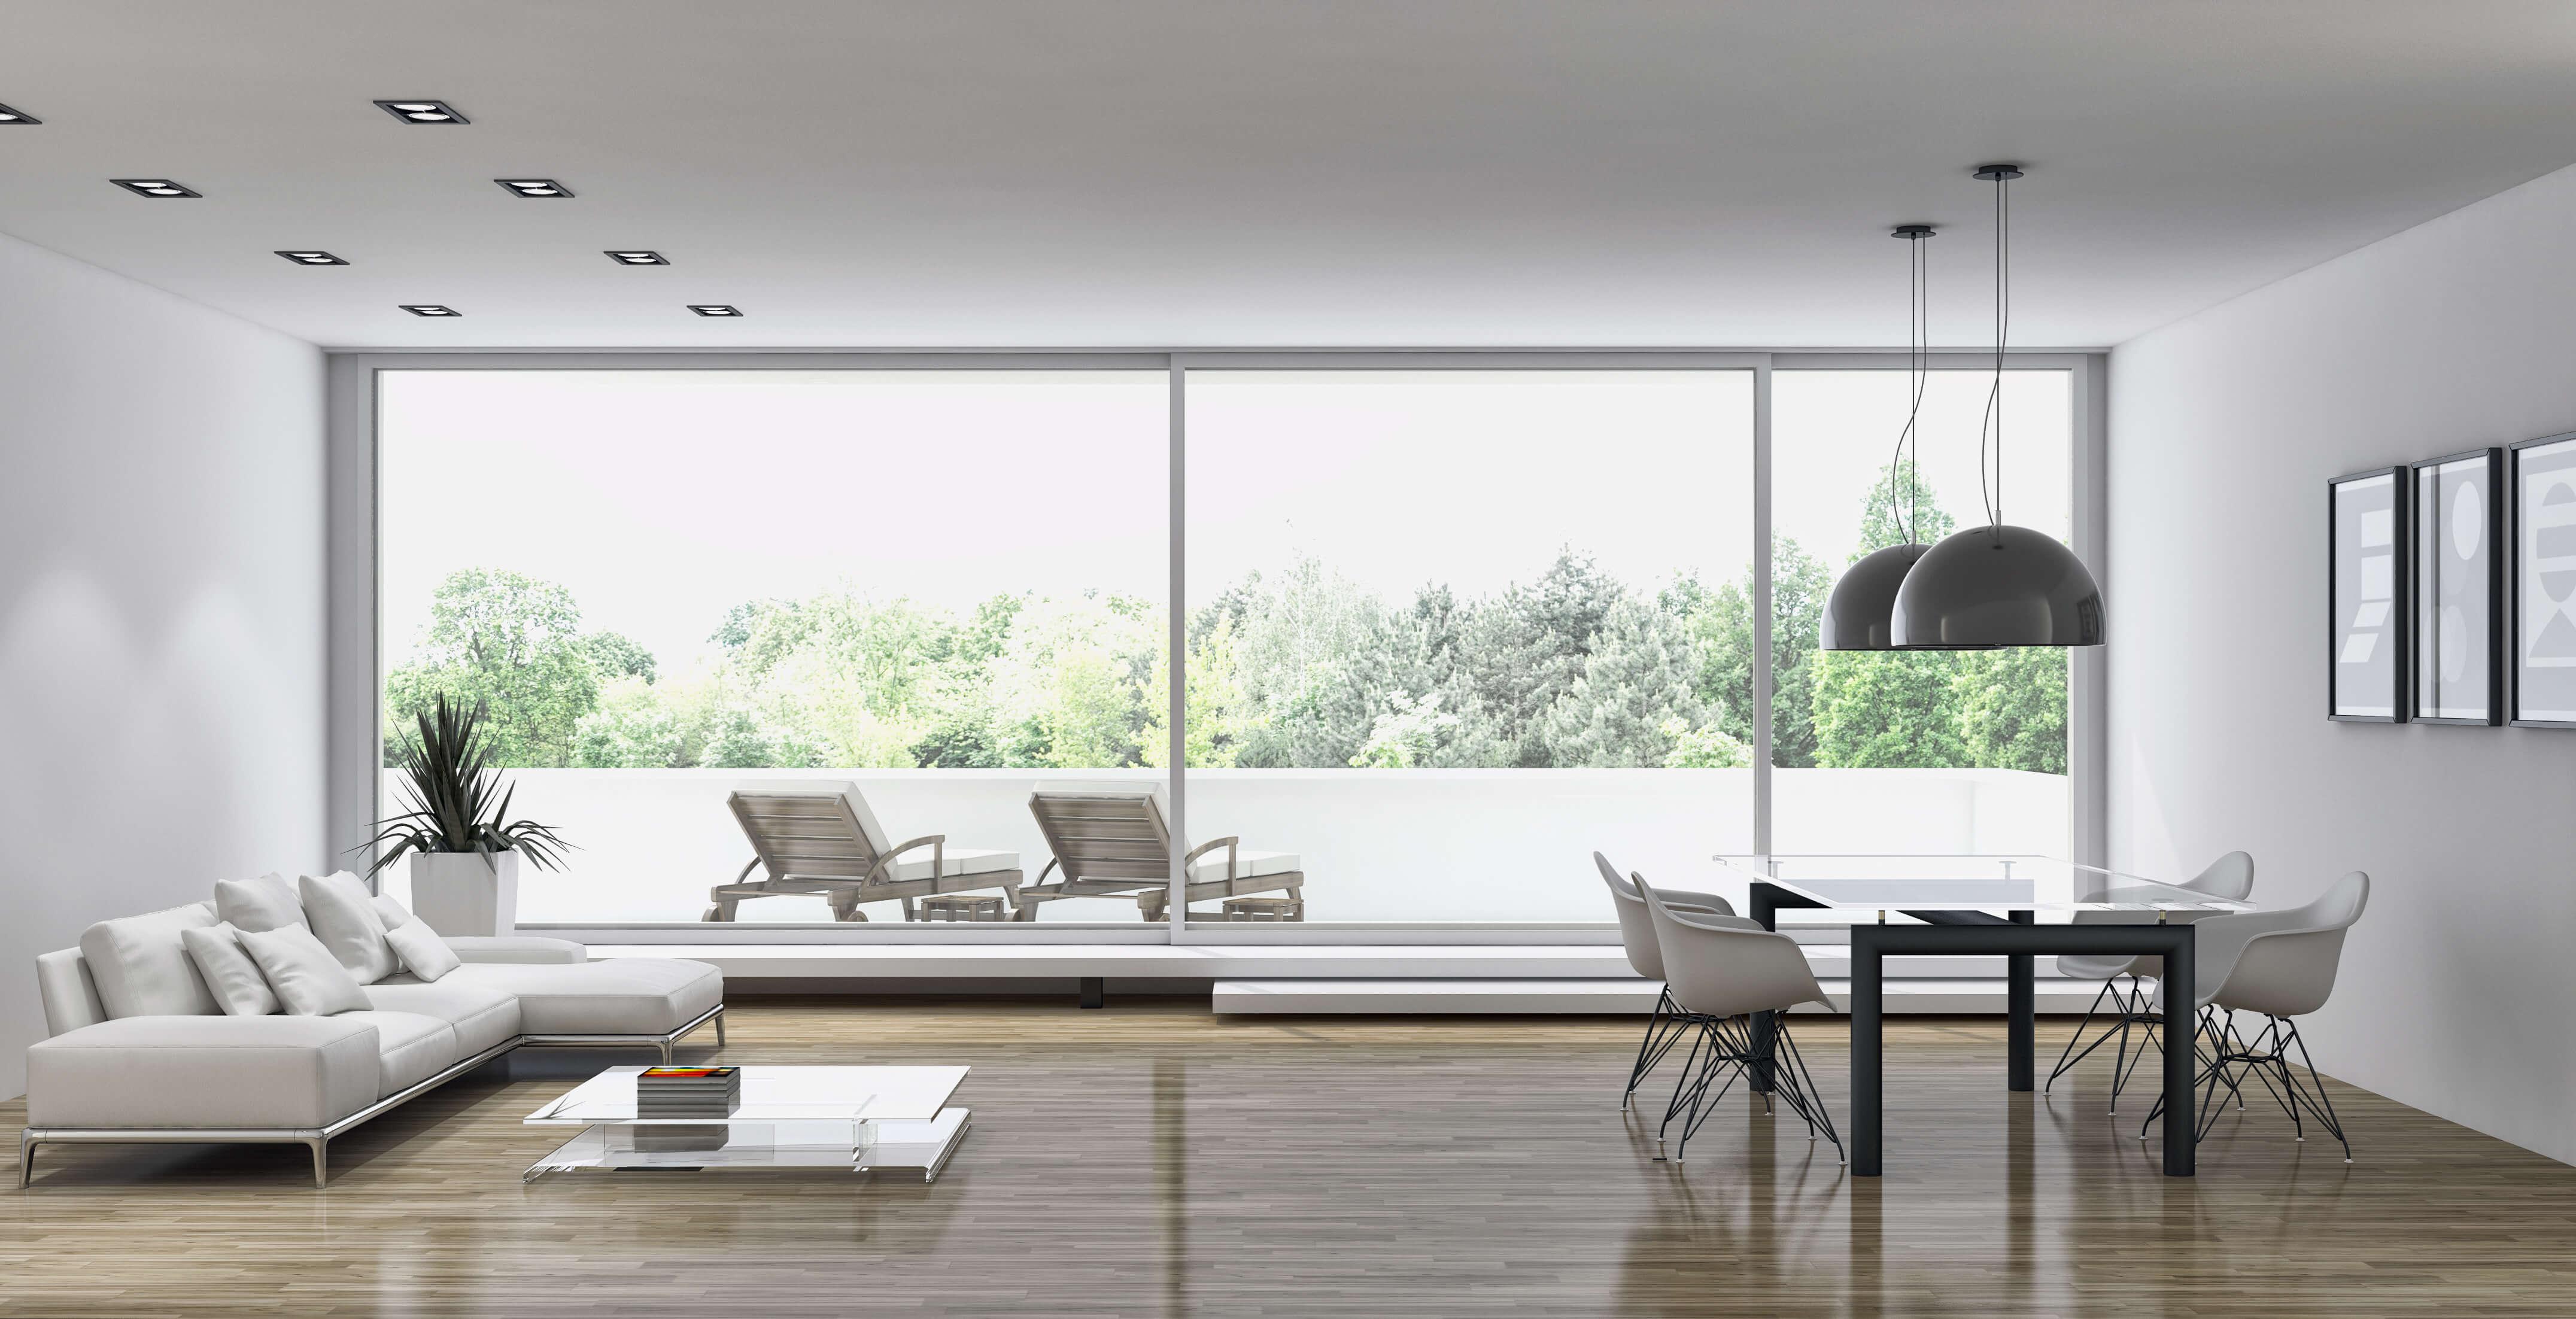 salotto minimale con finestre oknoplast